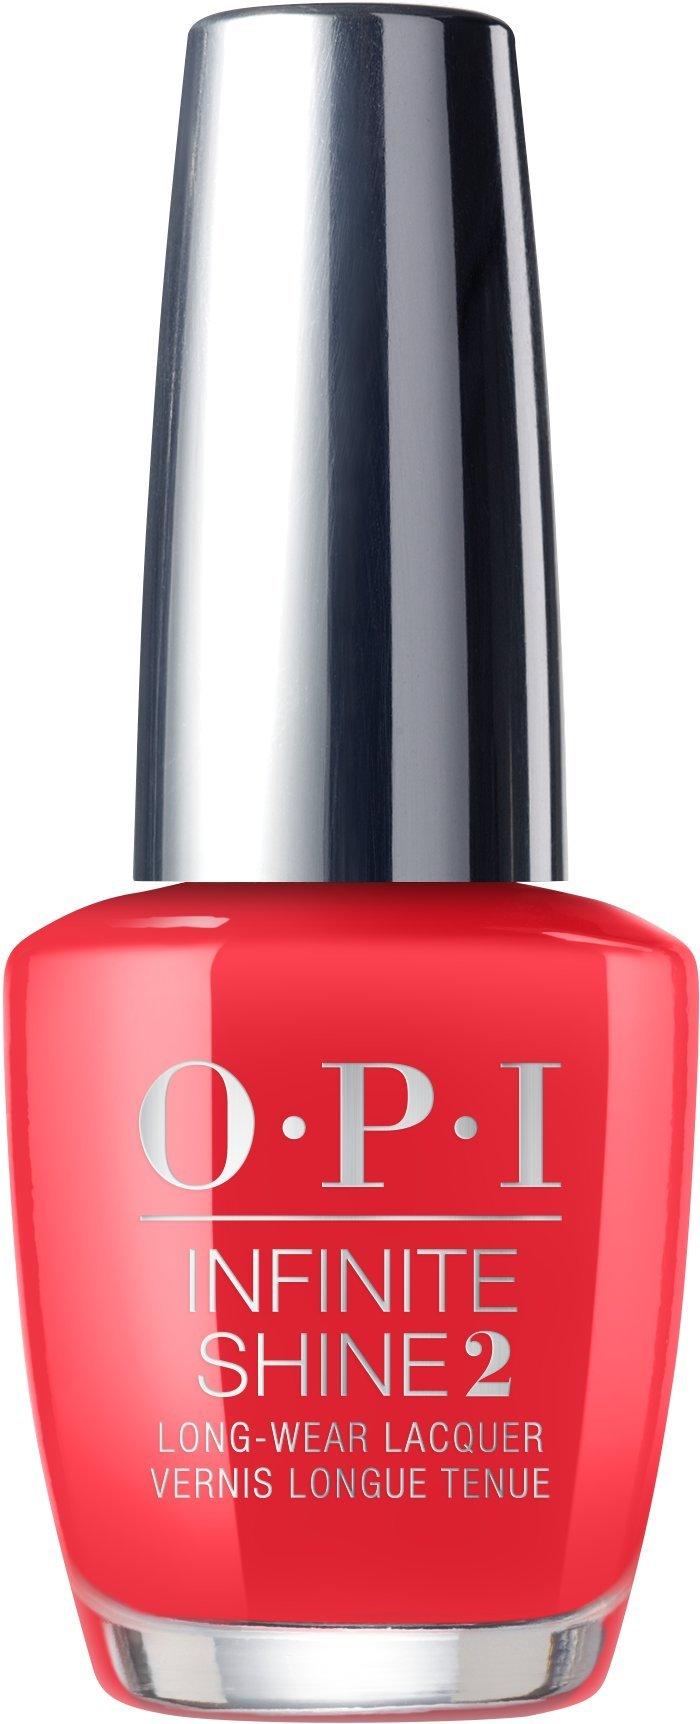 OPI Infinite Shine, Cajun Shrimp, 0.5 fl.oz.